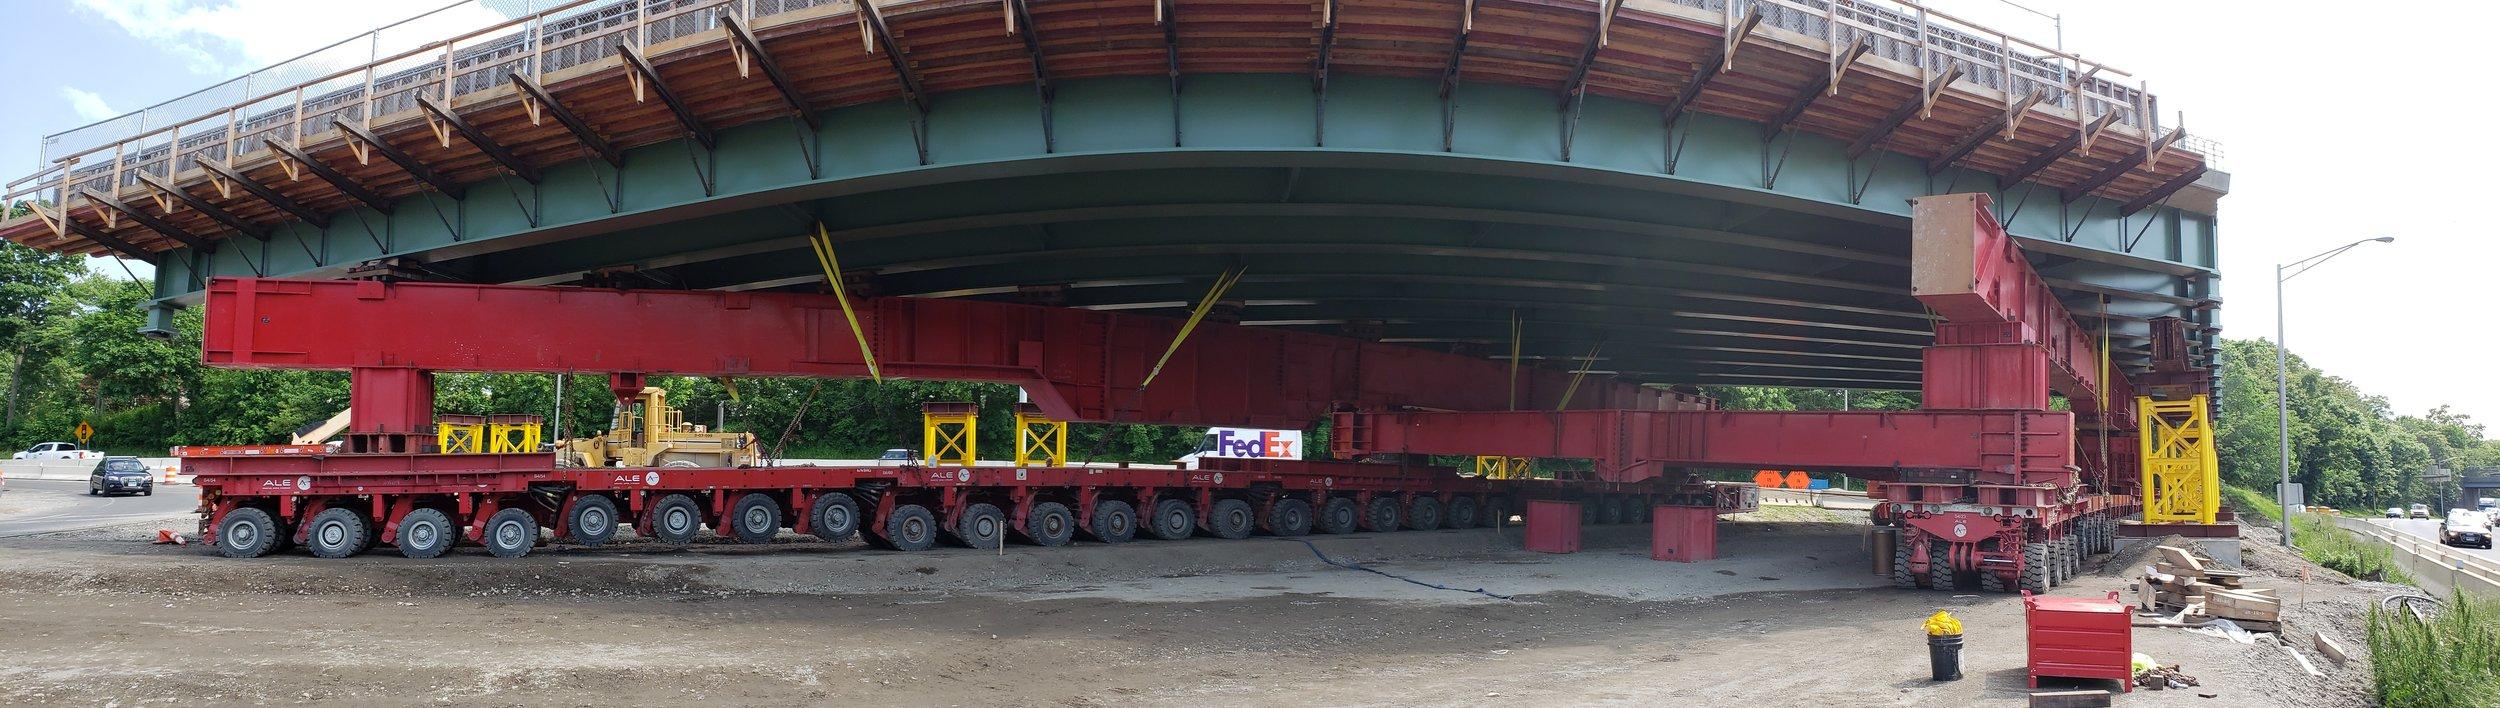 SPMT machine supporting bridge Span 2.  Taken by John Deliberto on 5/31/19